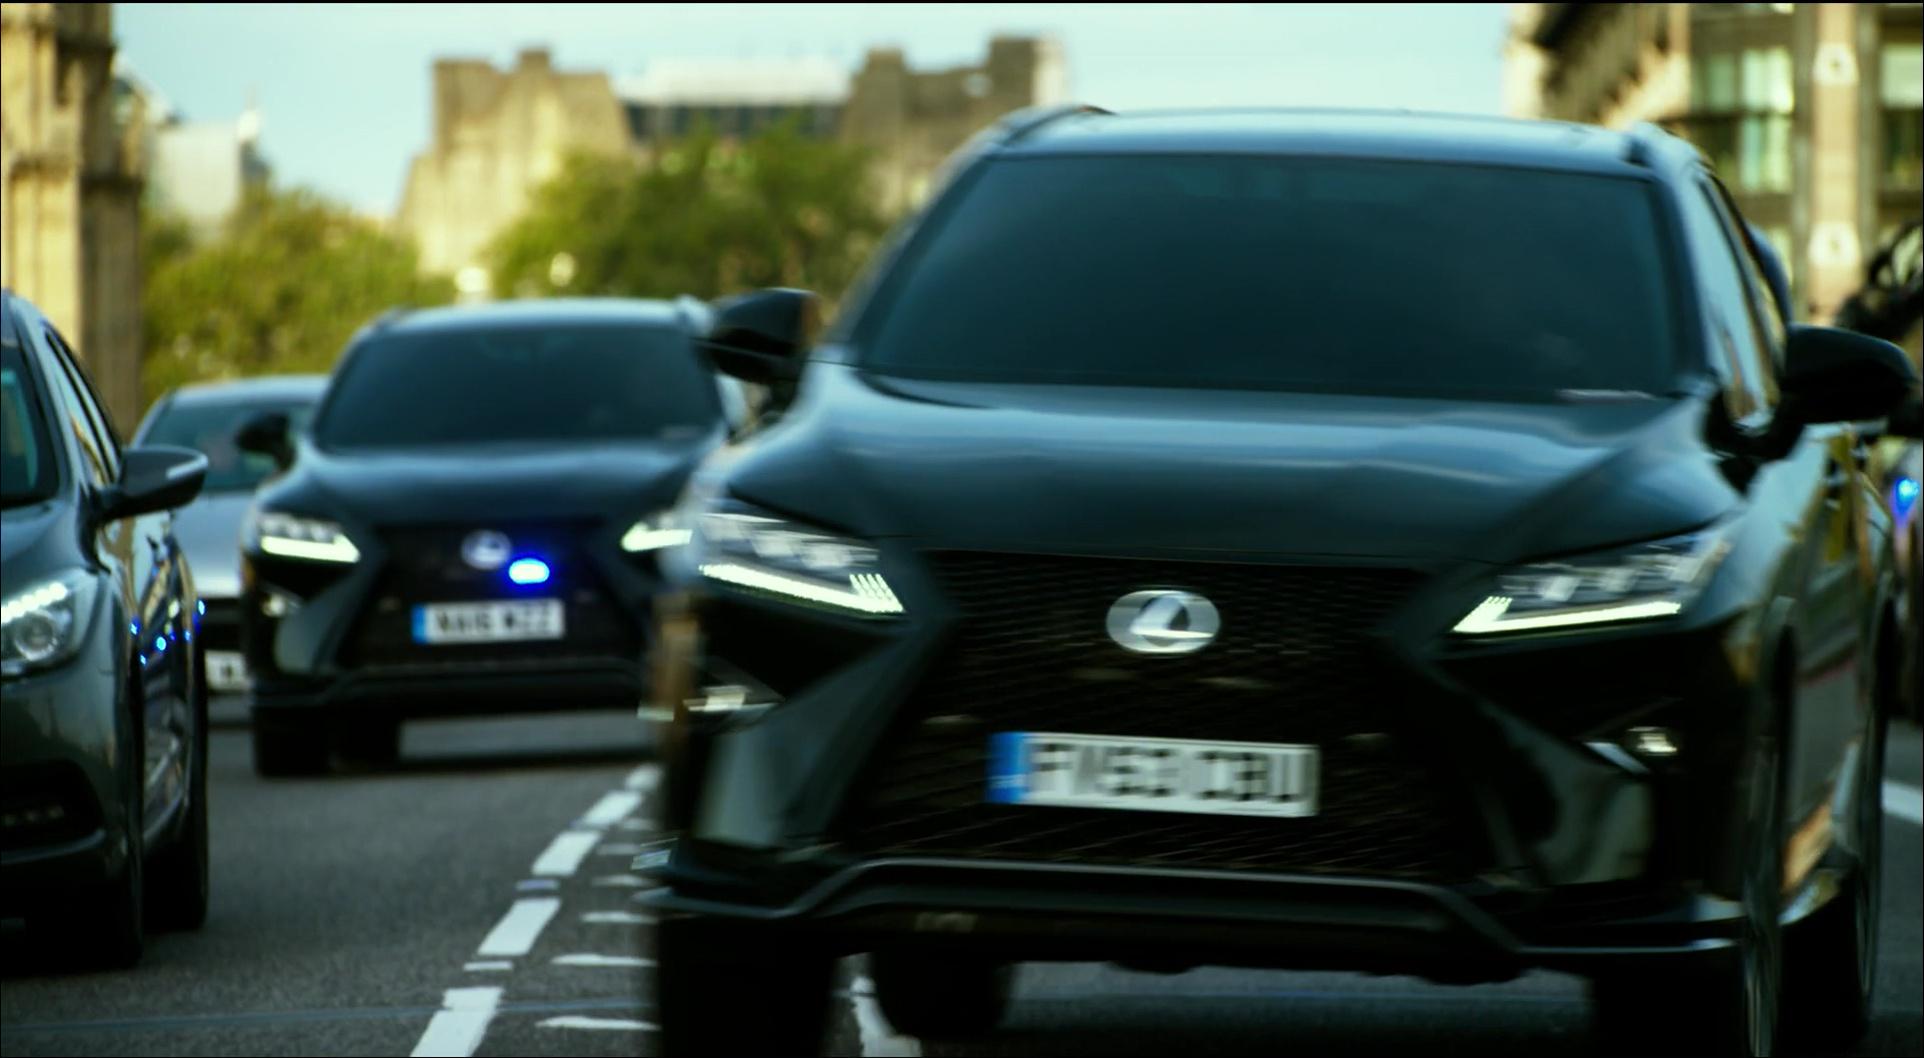 Black Lexus RX Cars in Transformers 5 The Last Knight 2017